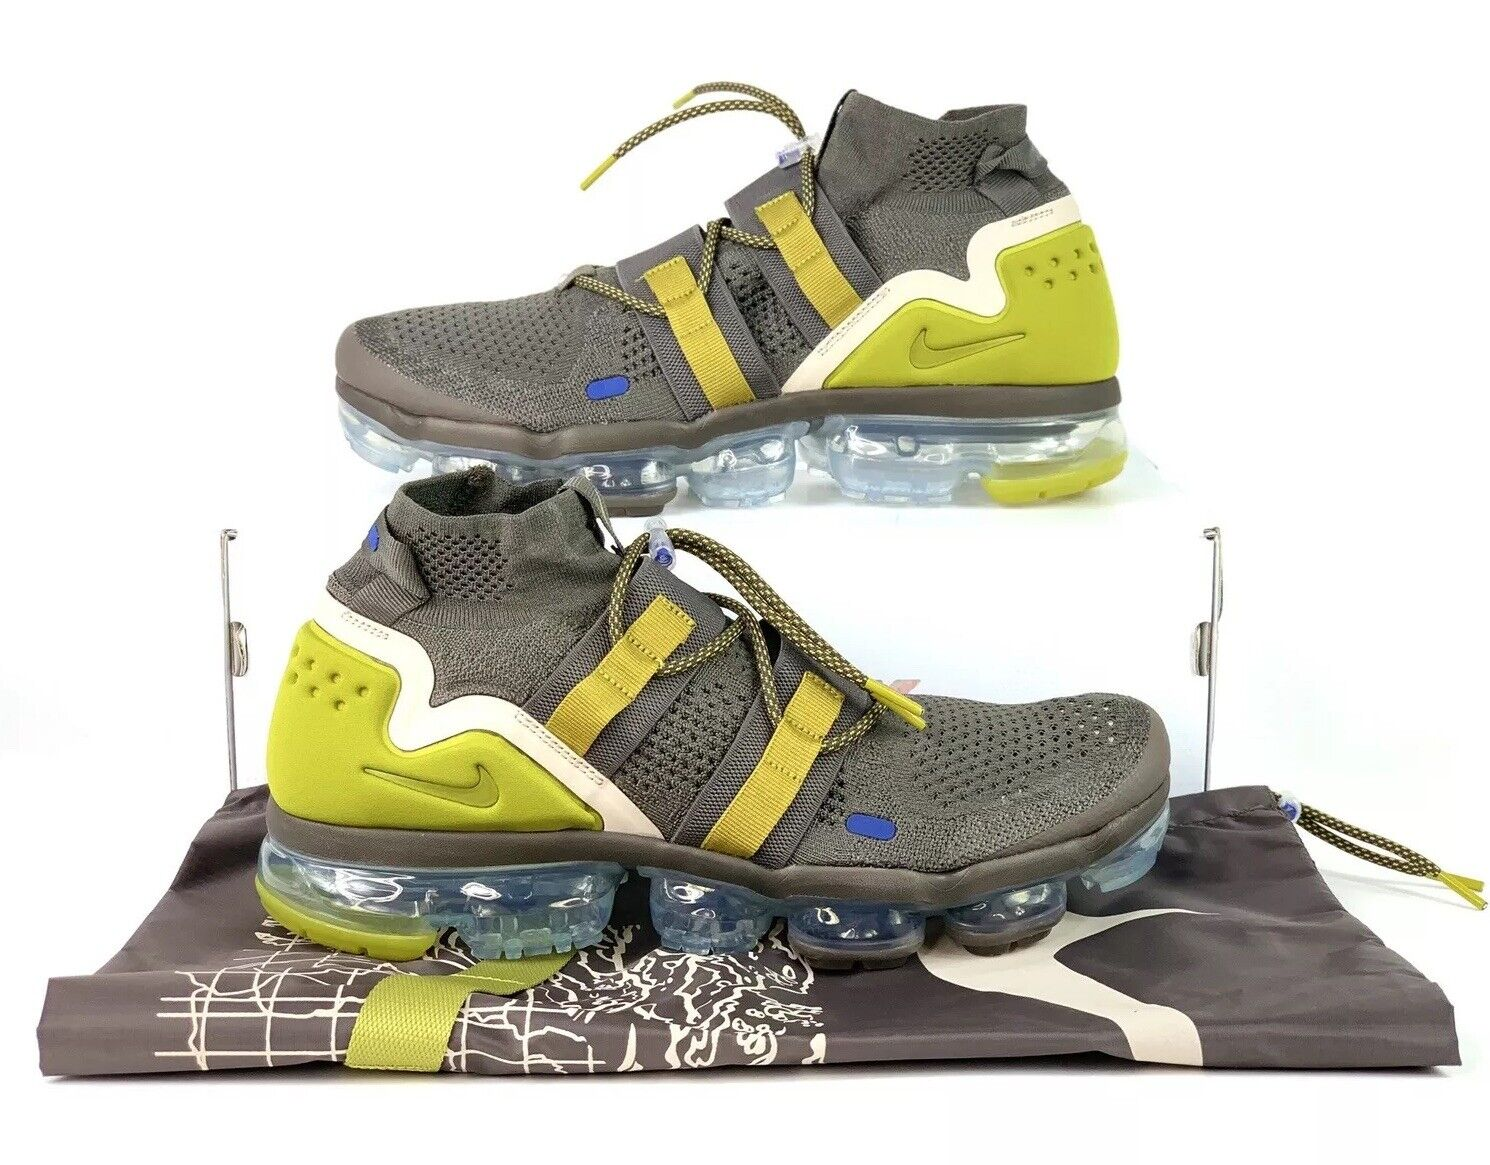 sports shoes 3c61b a3fba ... Nike Air VaporMax VaporMax VaporMax Flyknit Utility Ridgerock Peat Moss  AH6834-200 Sz 11.5 ac3a64 ...